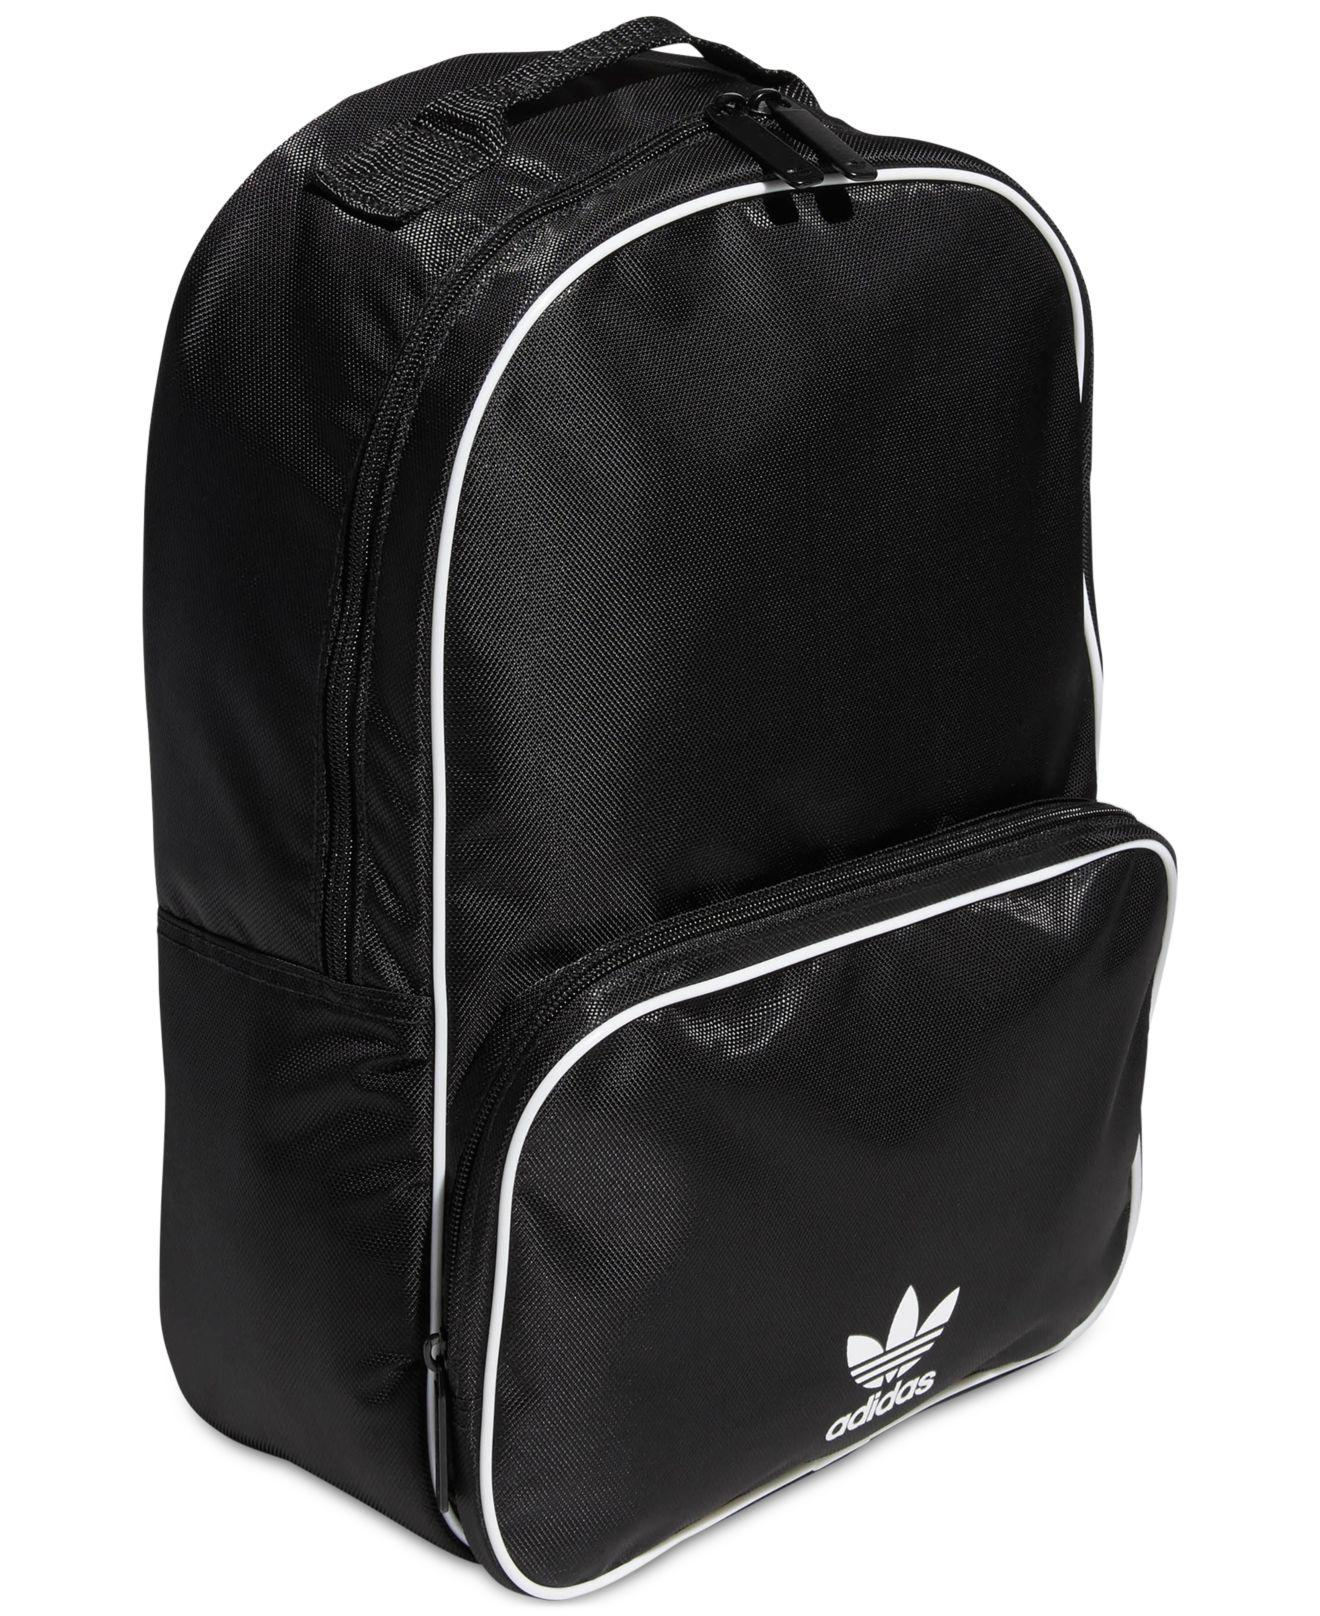 4b592c2b2f Adidas Originals Santiago Backpack in Black - Lyst